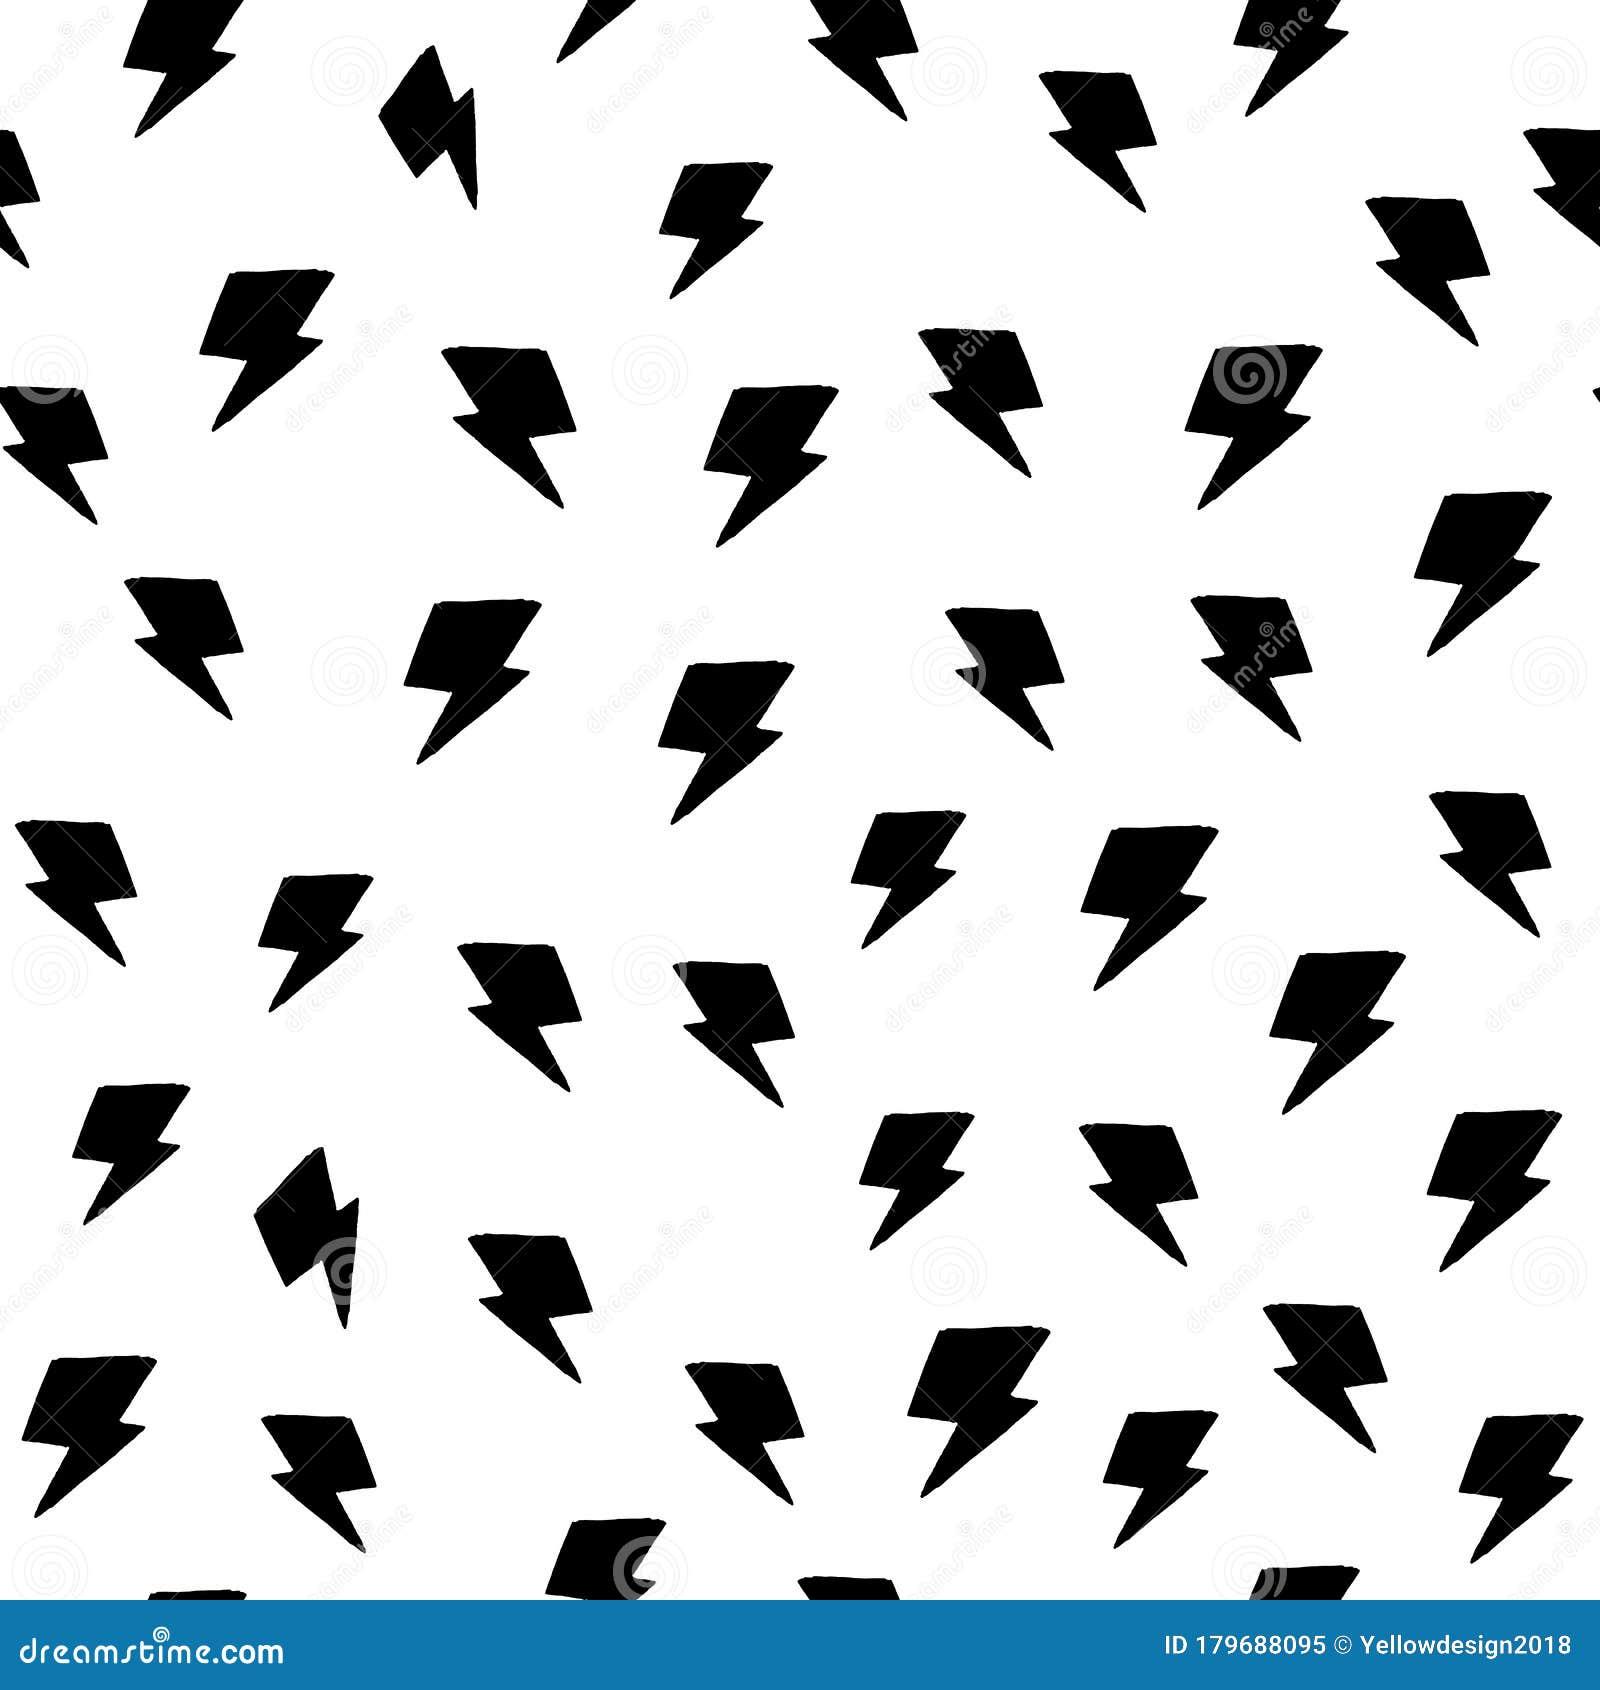 Random Thunder Backdrop Seamless Pattern On White Background Black Lightning Bolts Thunderbolt Wallpaper Stock Illustration Illustration Of Black Fabric 179688095,Principles Of Design Pattern Picture